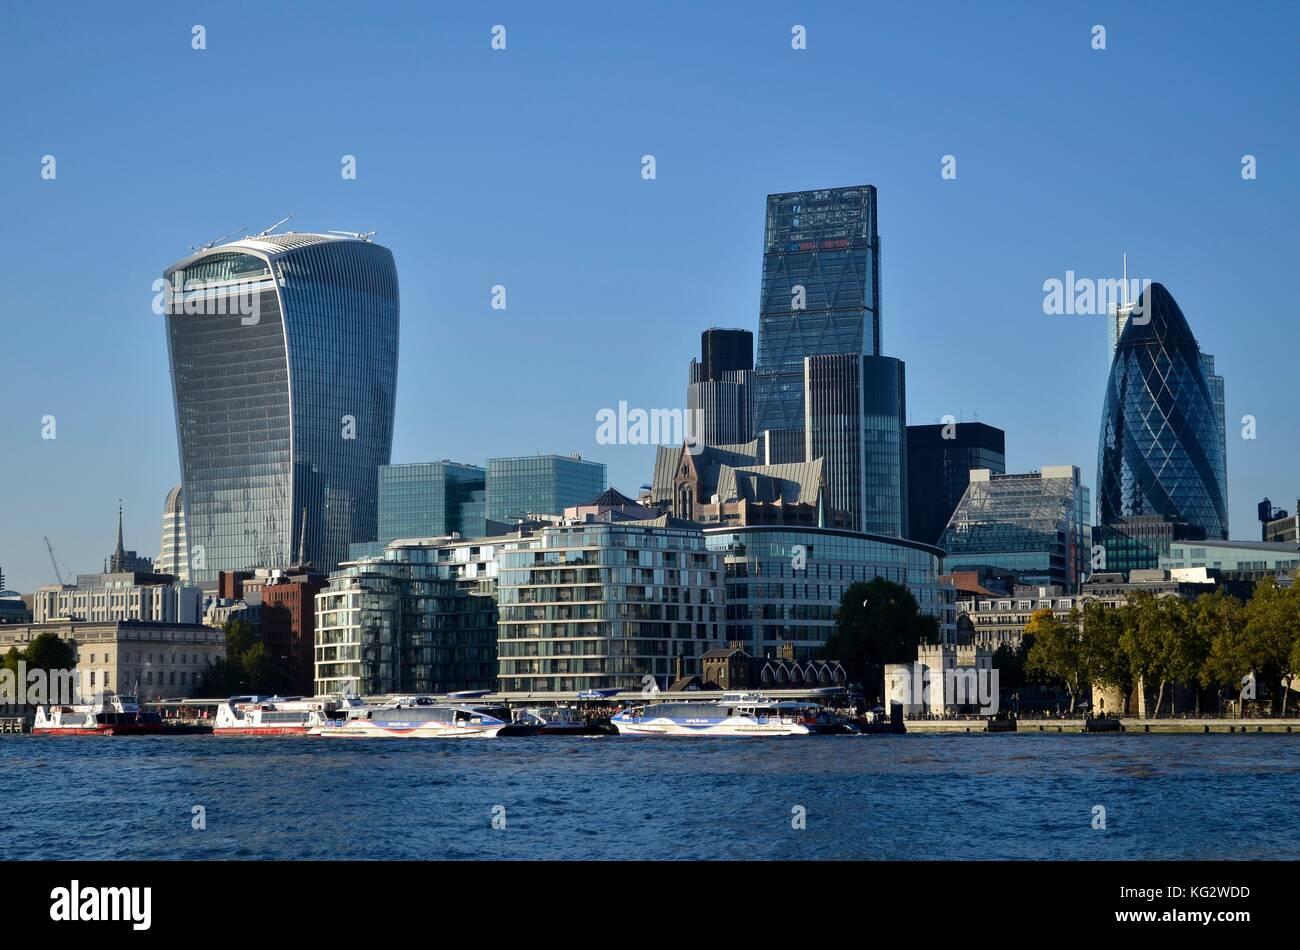 Financial District, London, UK. 20 Fenchurch Street, Leadenhall Gebäude, Turm 42, und Gurke alle sichtbar. Stockbild